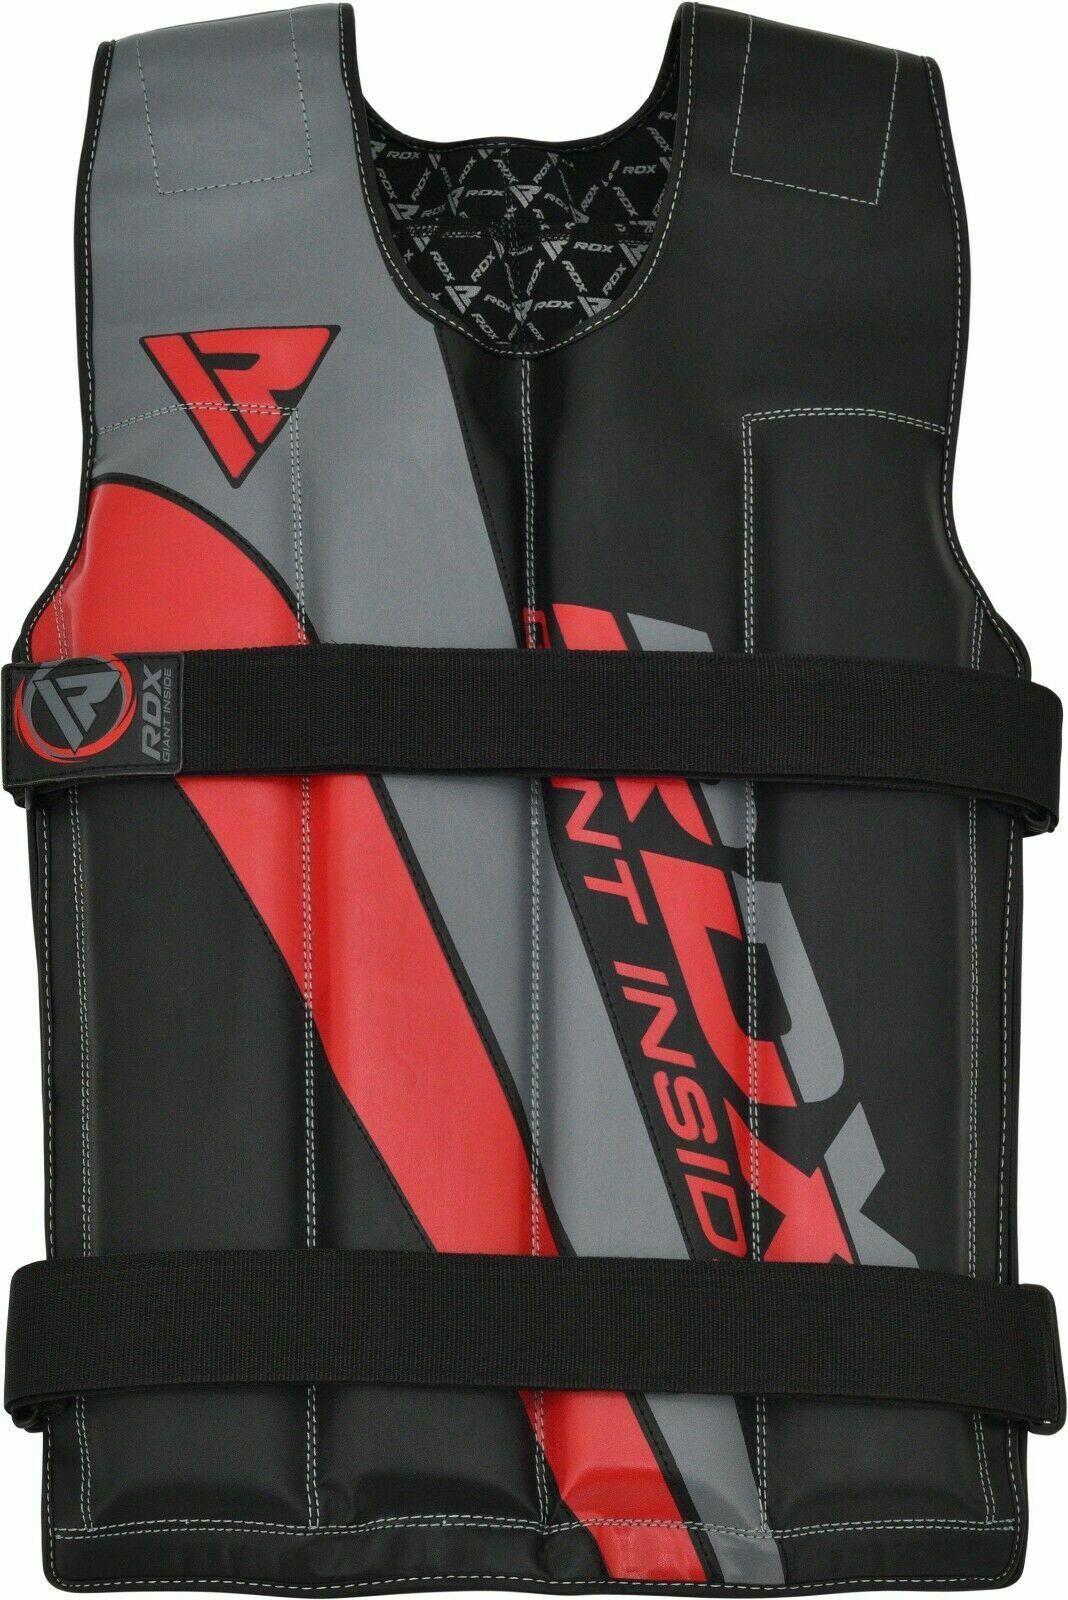 RDX 18 22 LB Weighted Vest Adjustable Training Fitness Worko